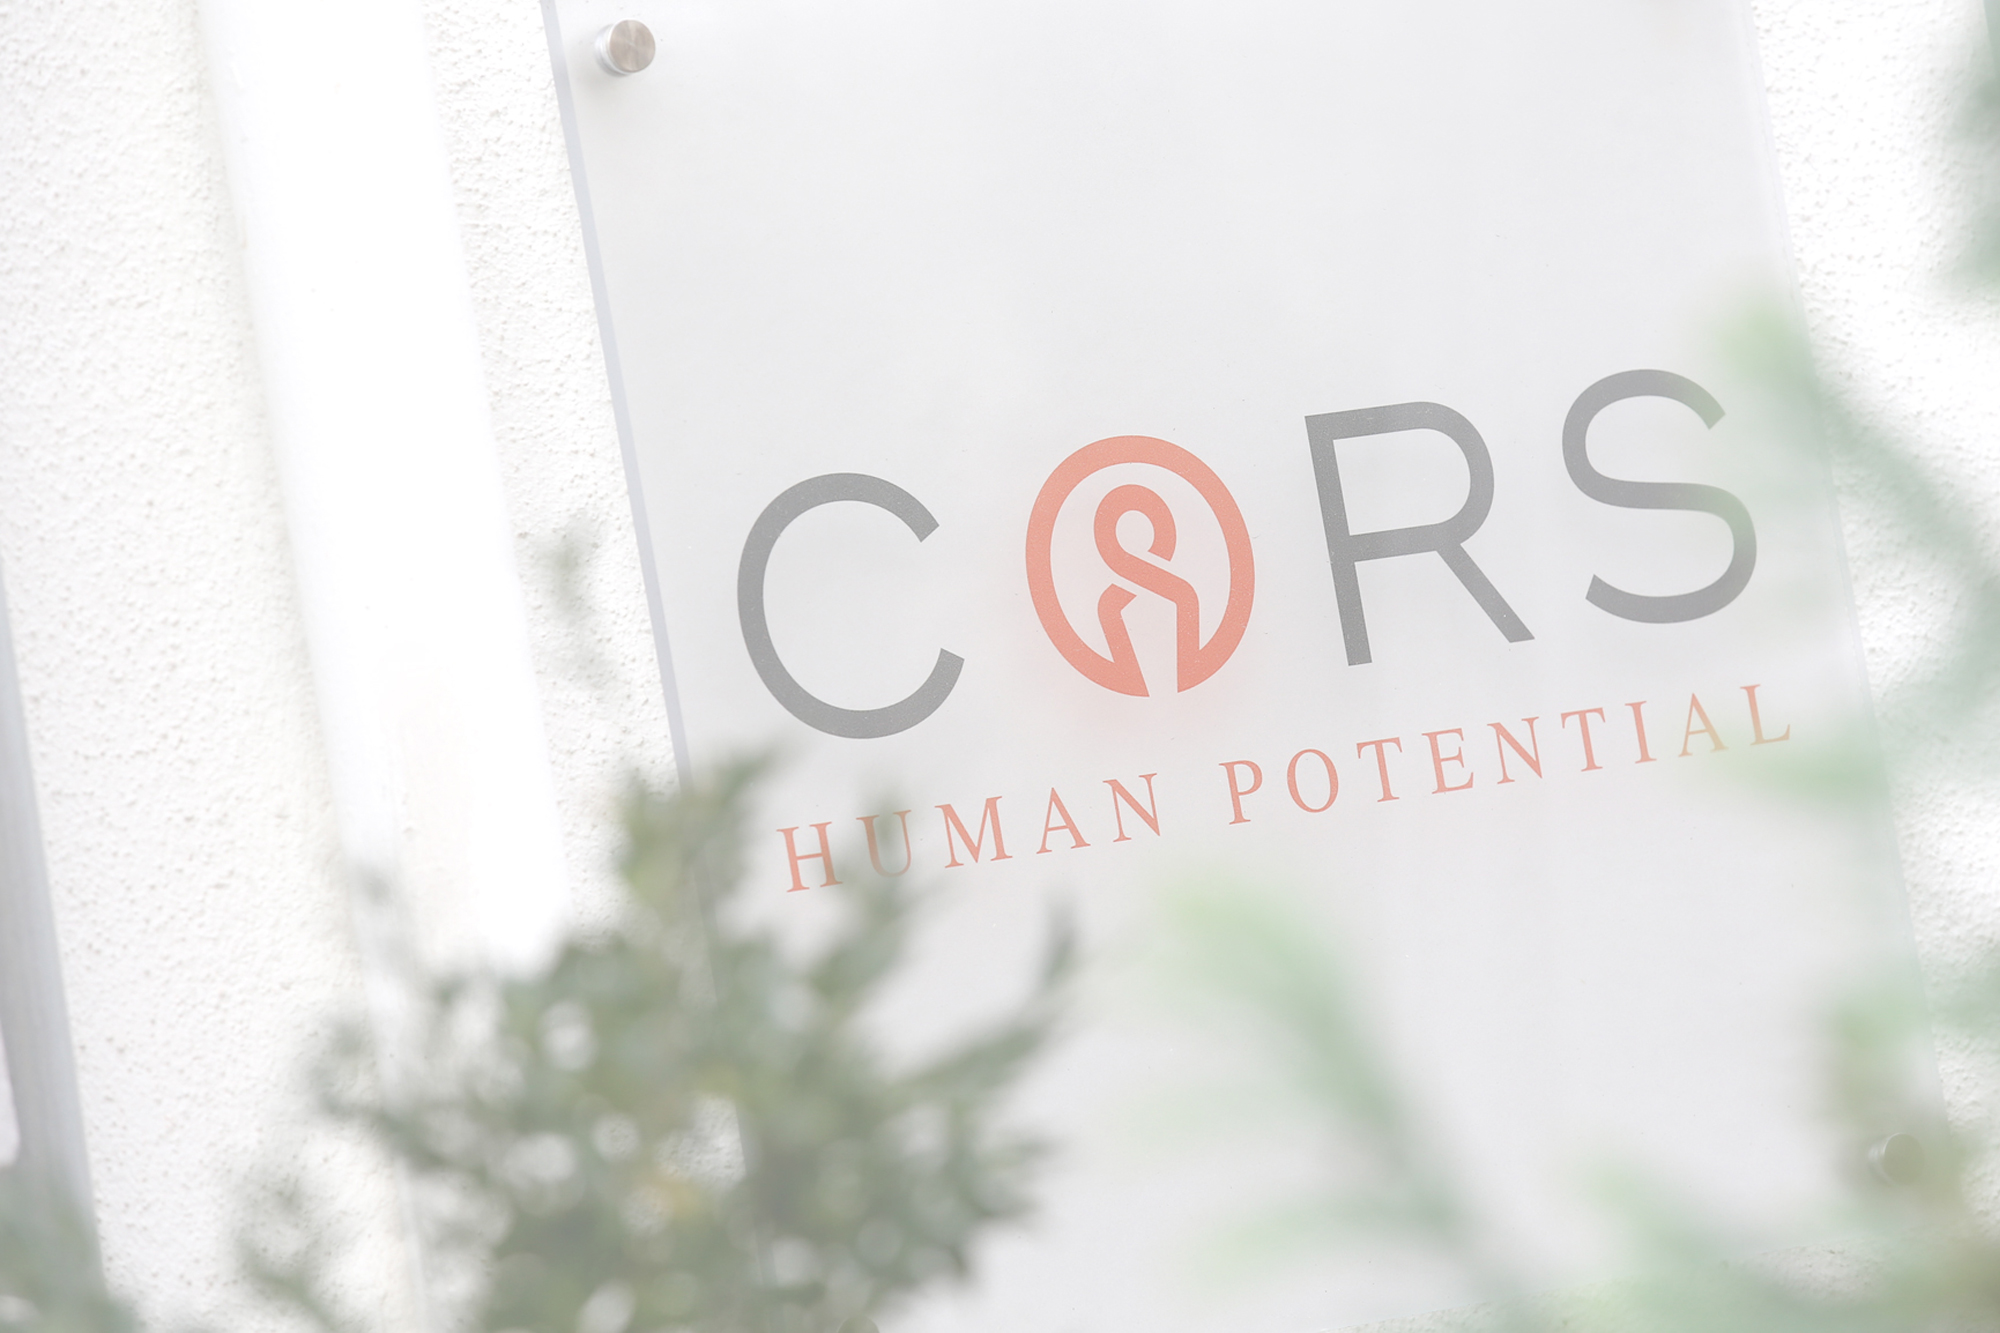 CORS Human Potential Slider